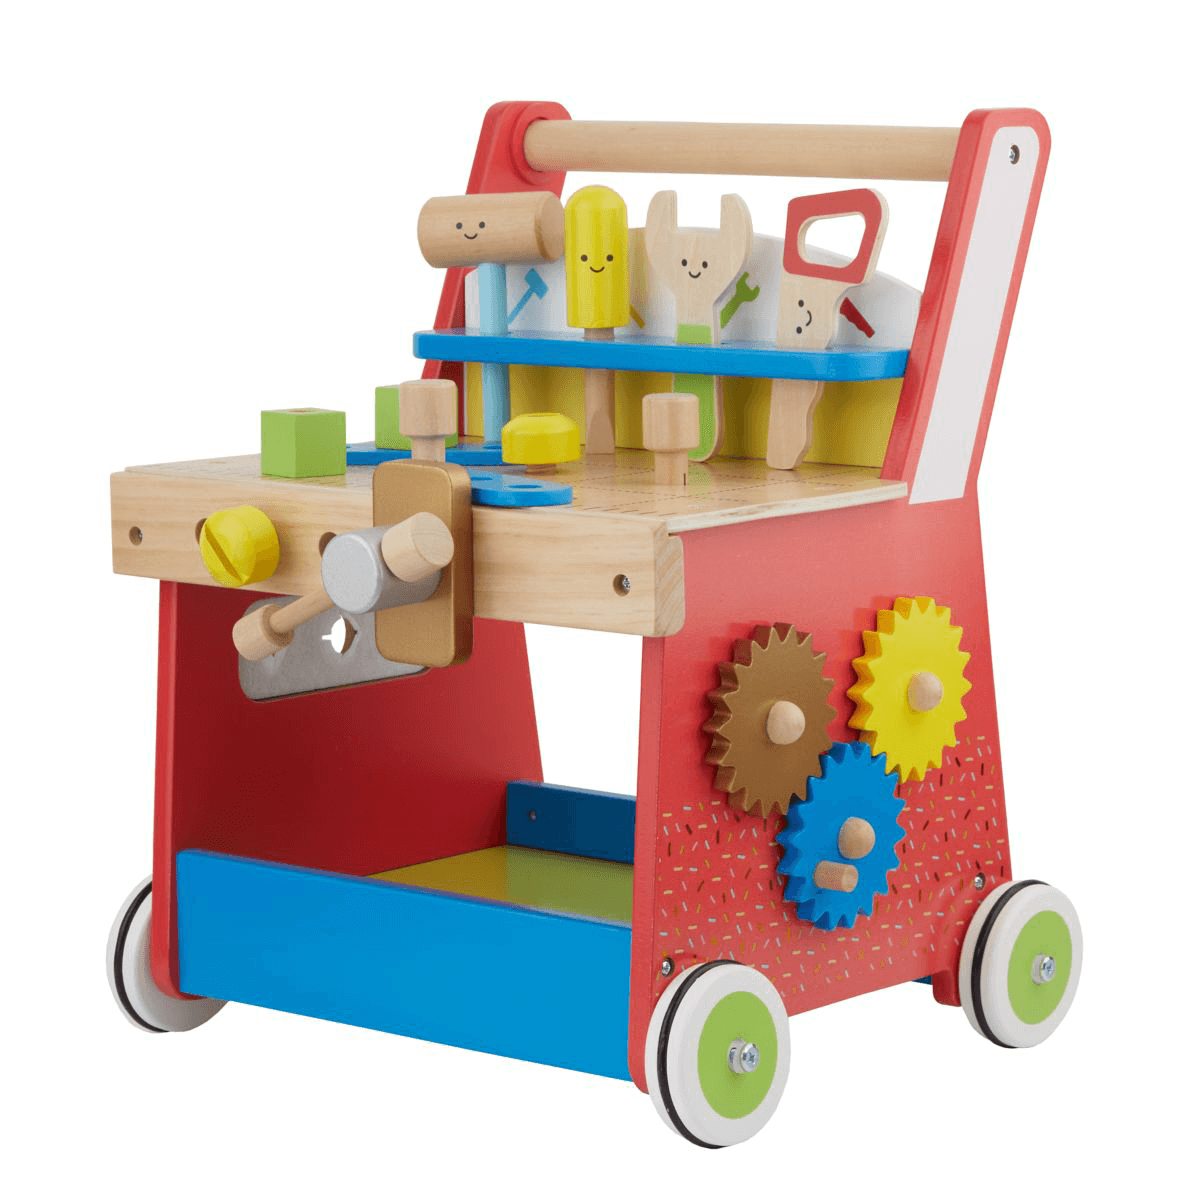 Activity Toys | Educational Toys, Baby